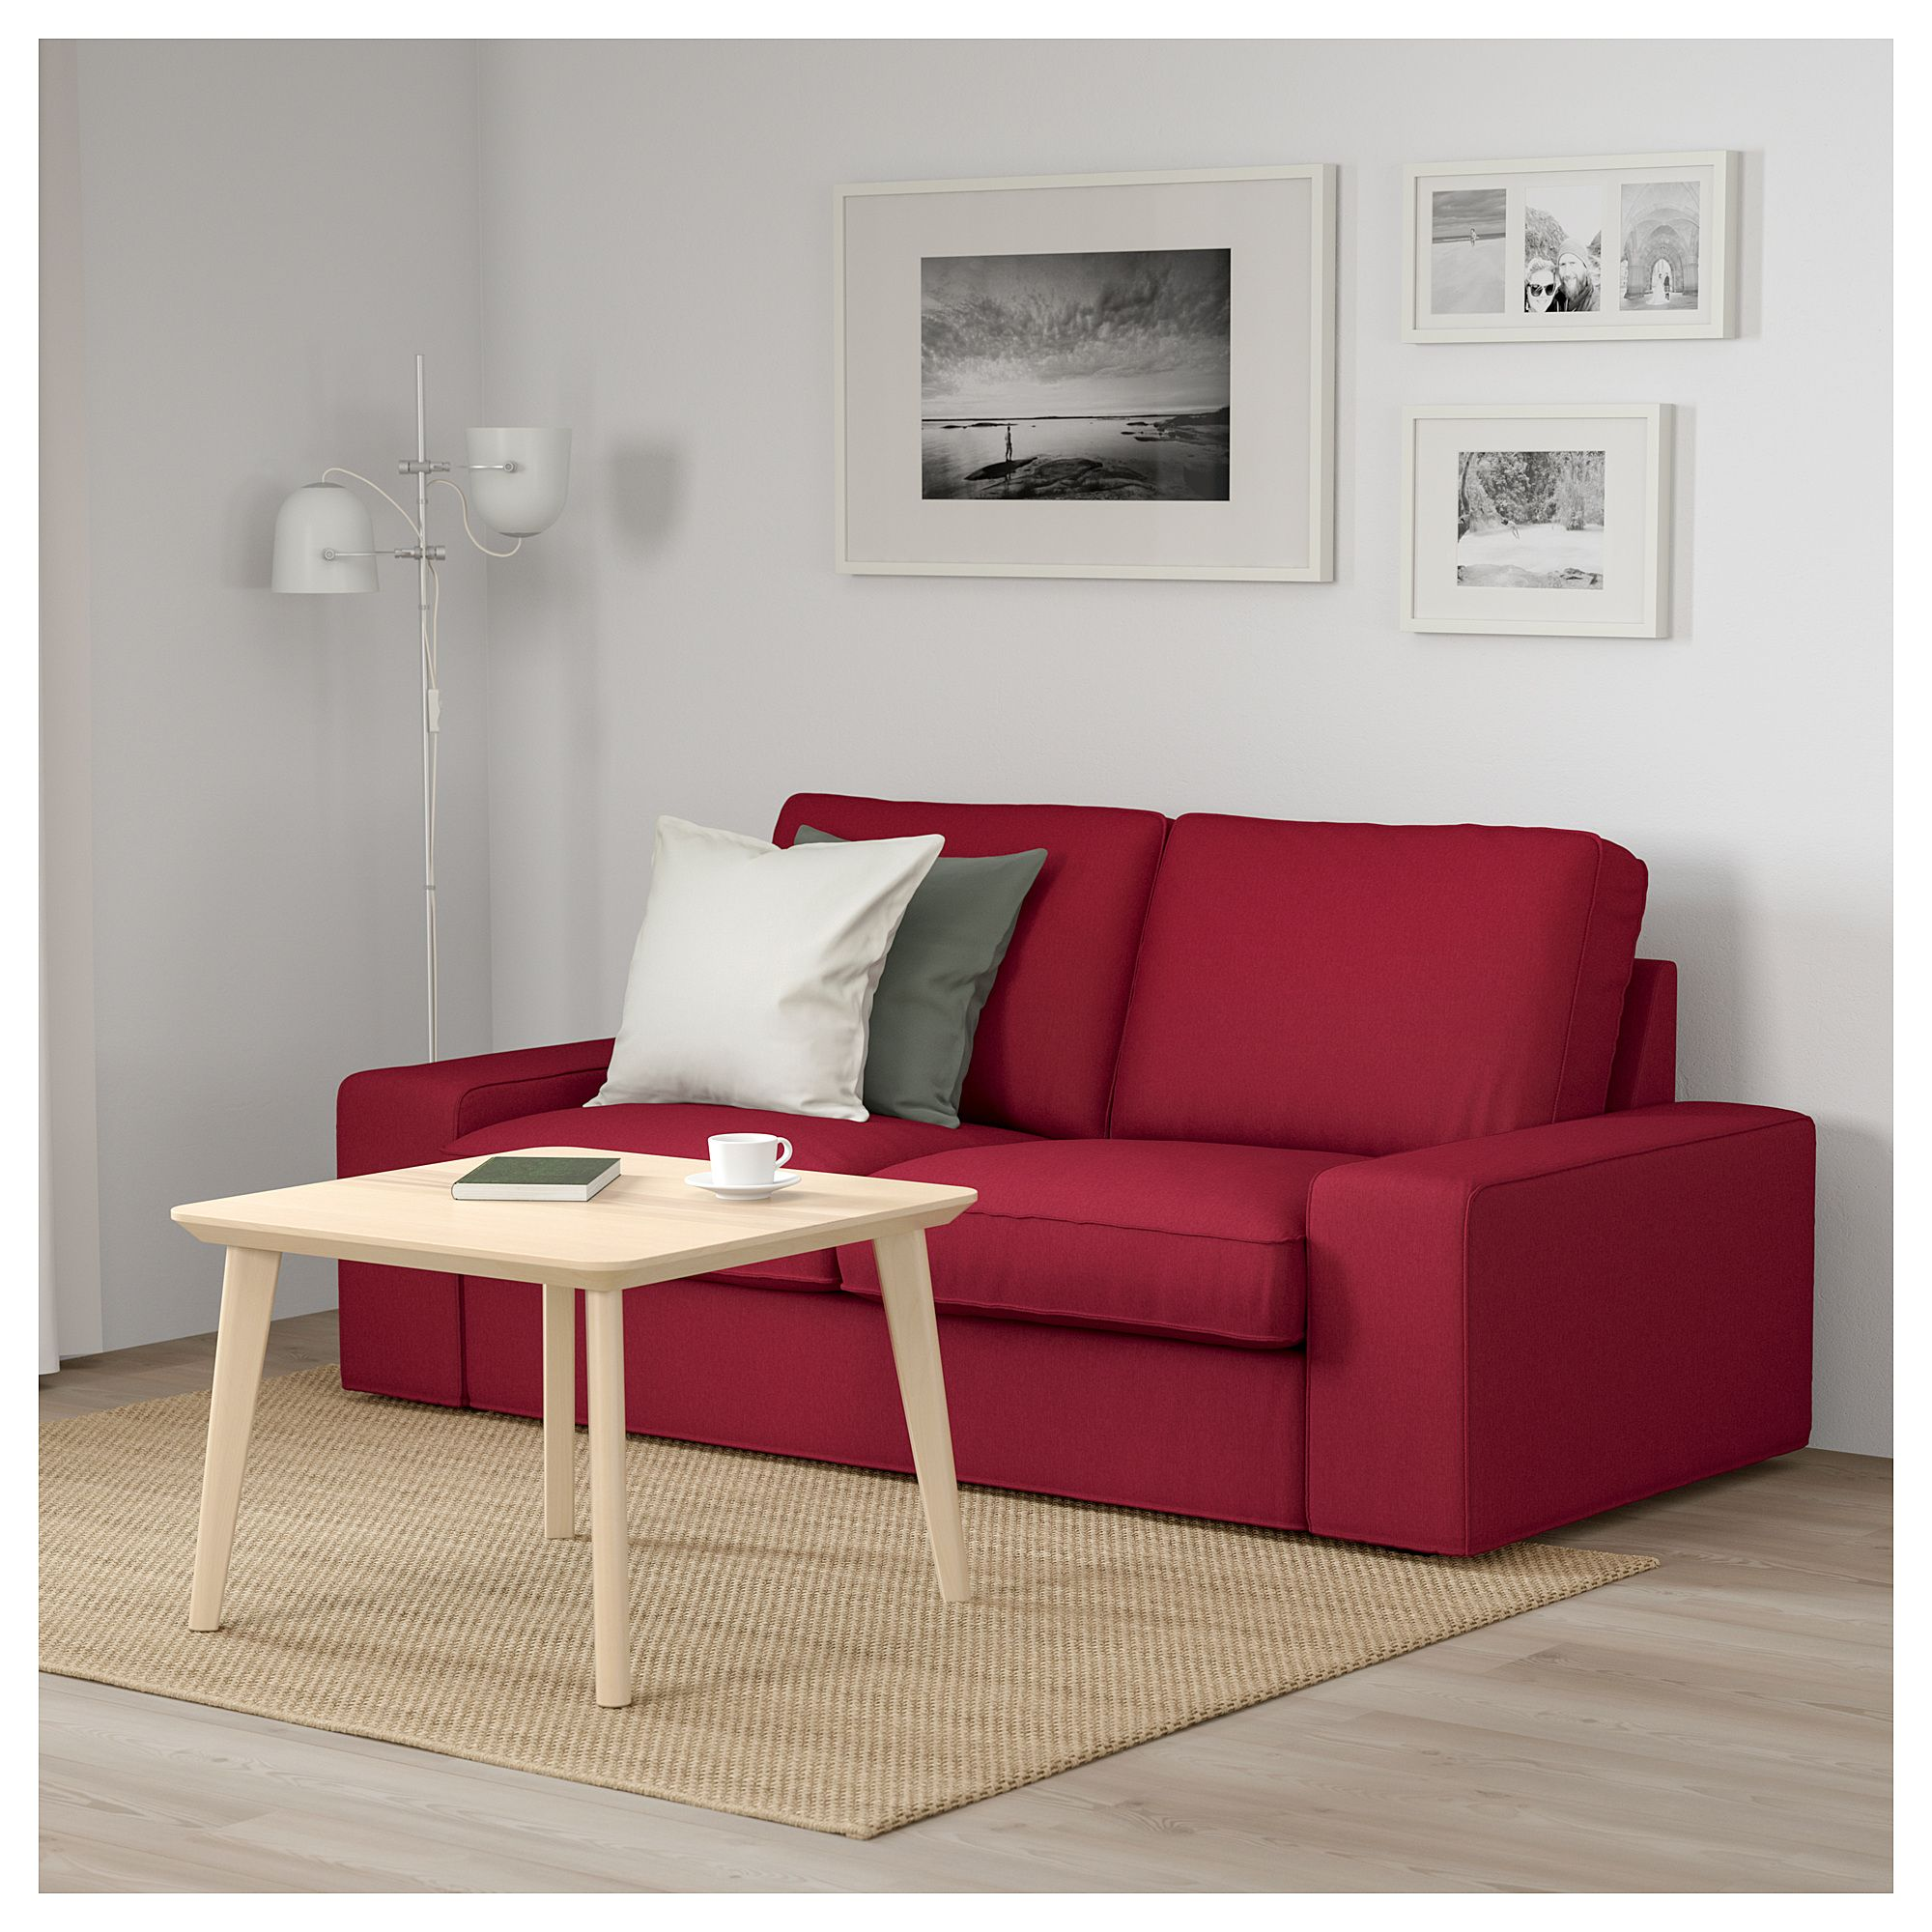 ikea kivik loveseat orrsta red christine rukere sofa sofa rh pinterest com